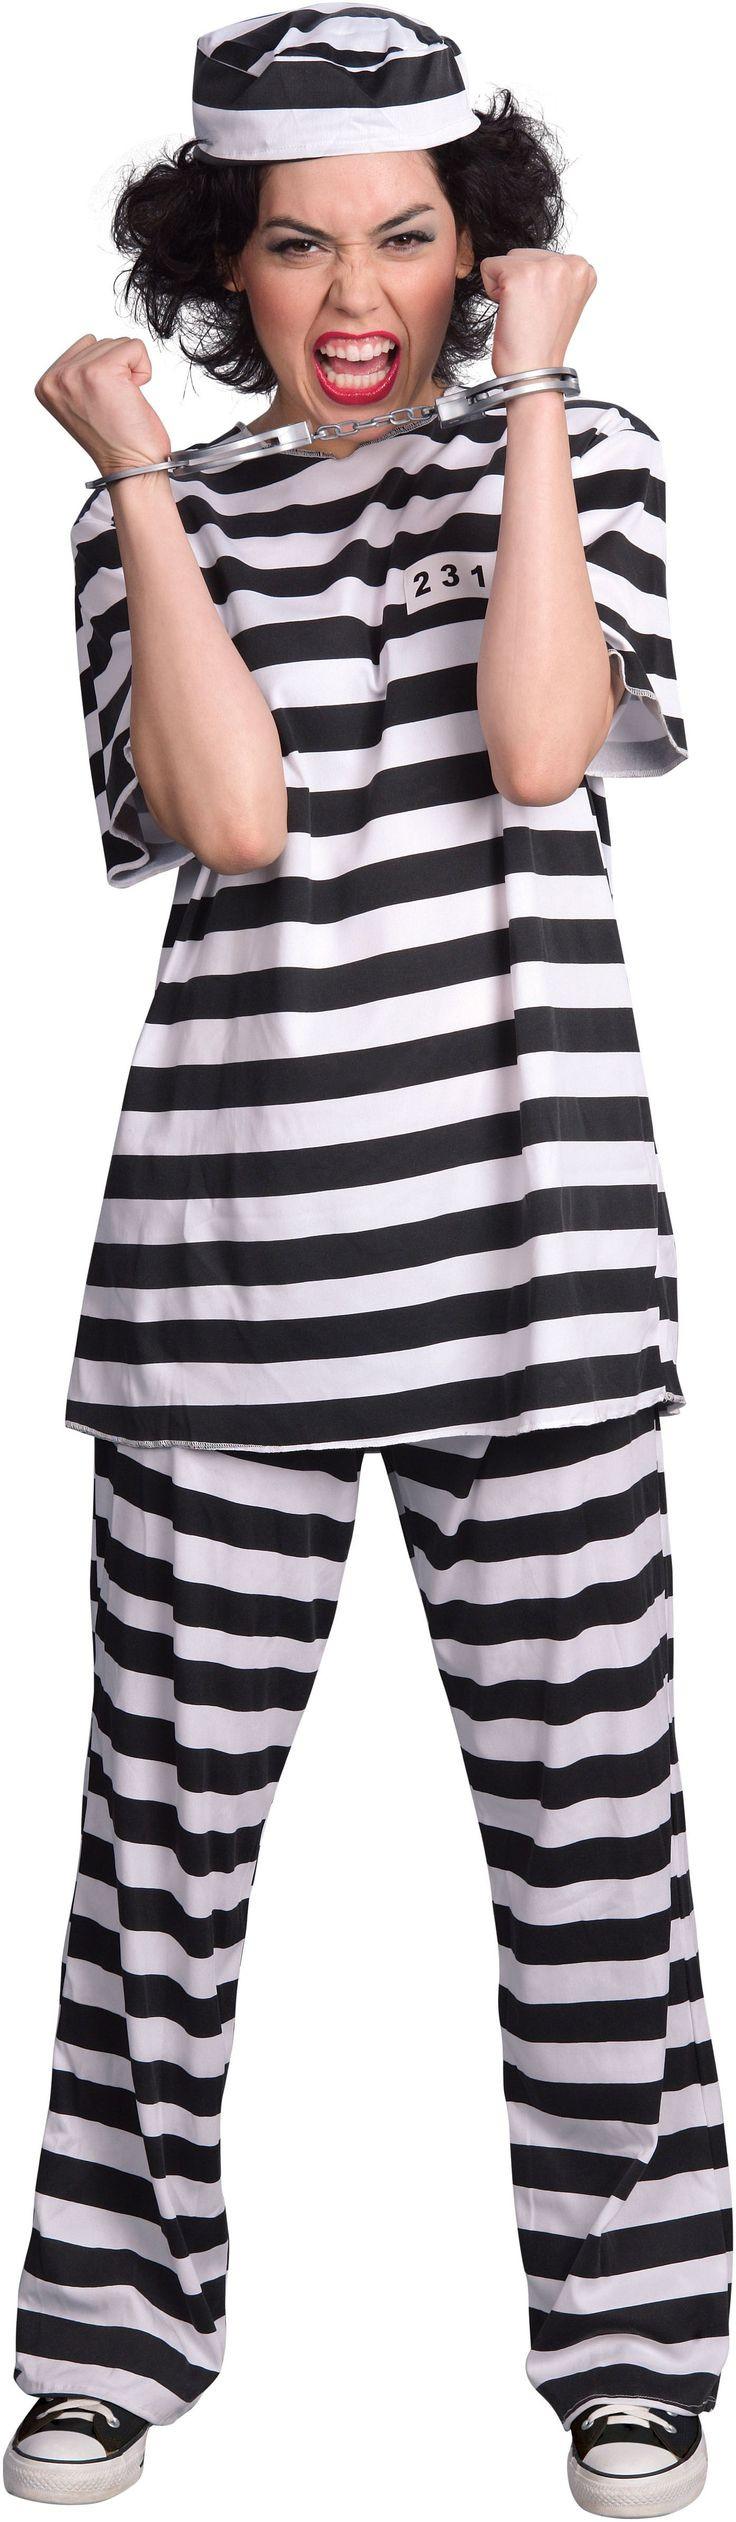 Best ideas about DIY Prisoner Costume . Save or Pin Female Prisoner Adult Costume Now.